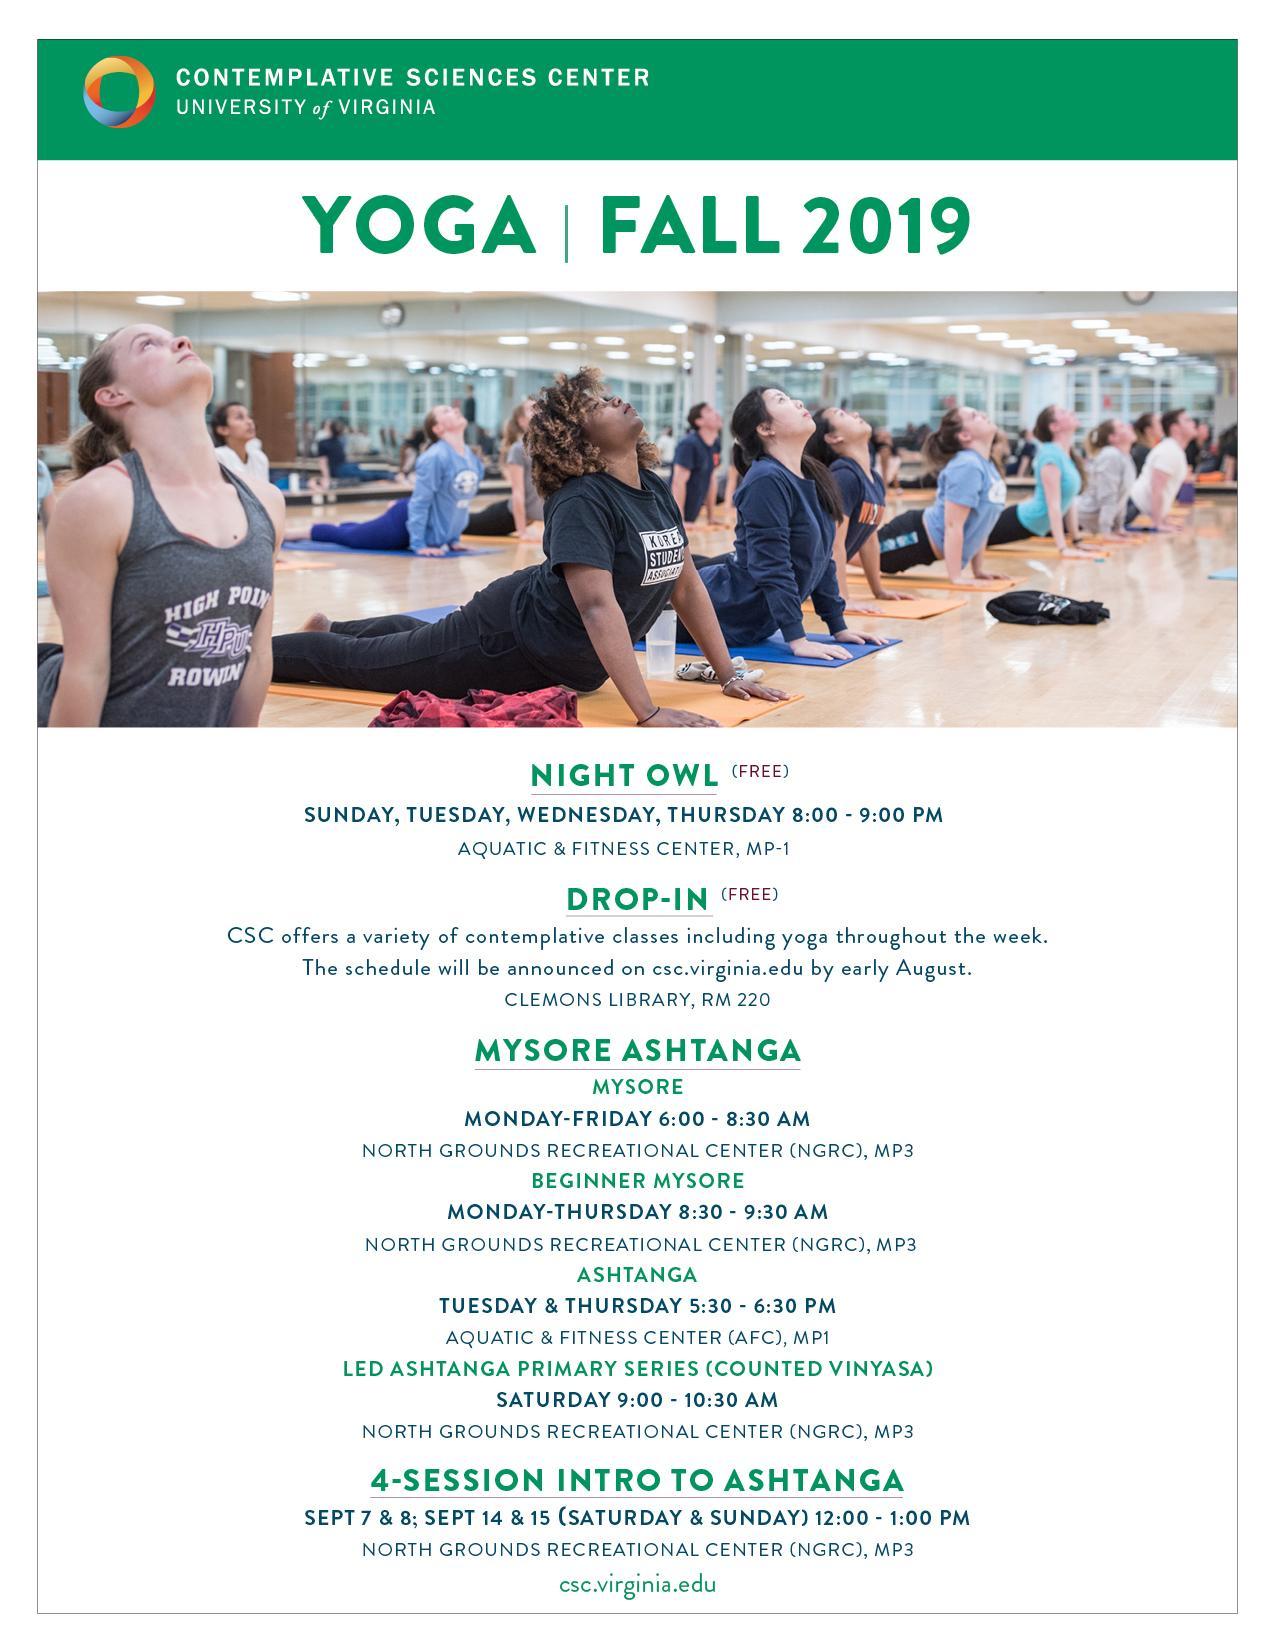 Yoga 2019 | Contemplative Sciences Center